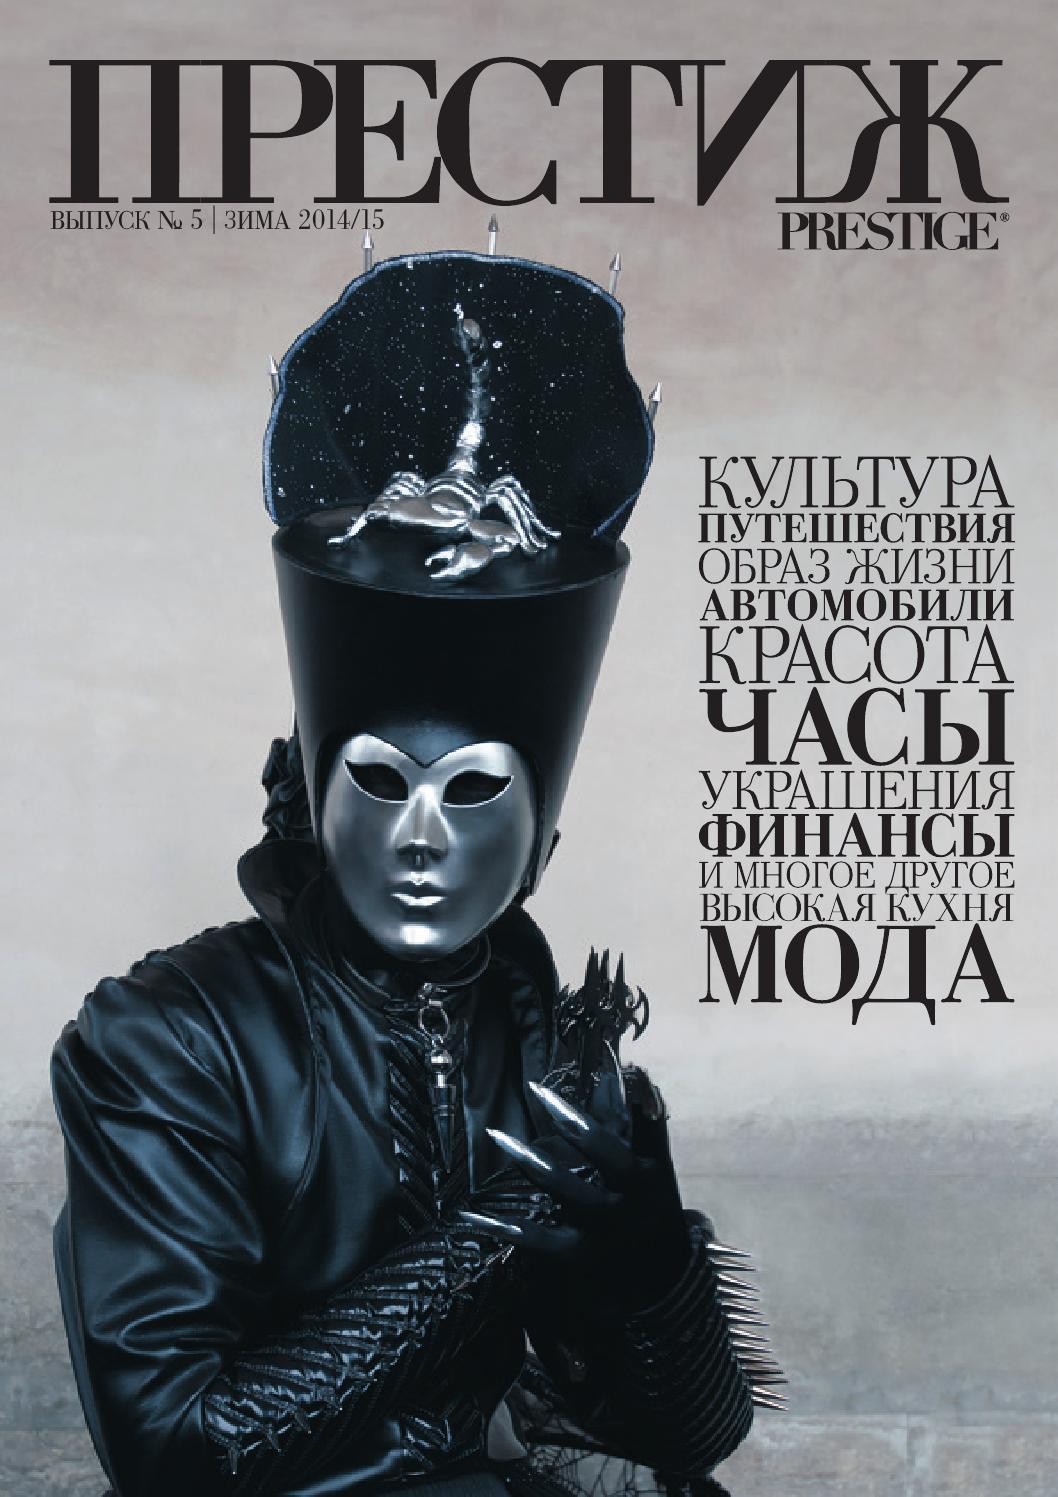 PRESTIGE Russkiy Volume 5 by rundschauMEDIEN AG - issuu 45dc579ec81